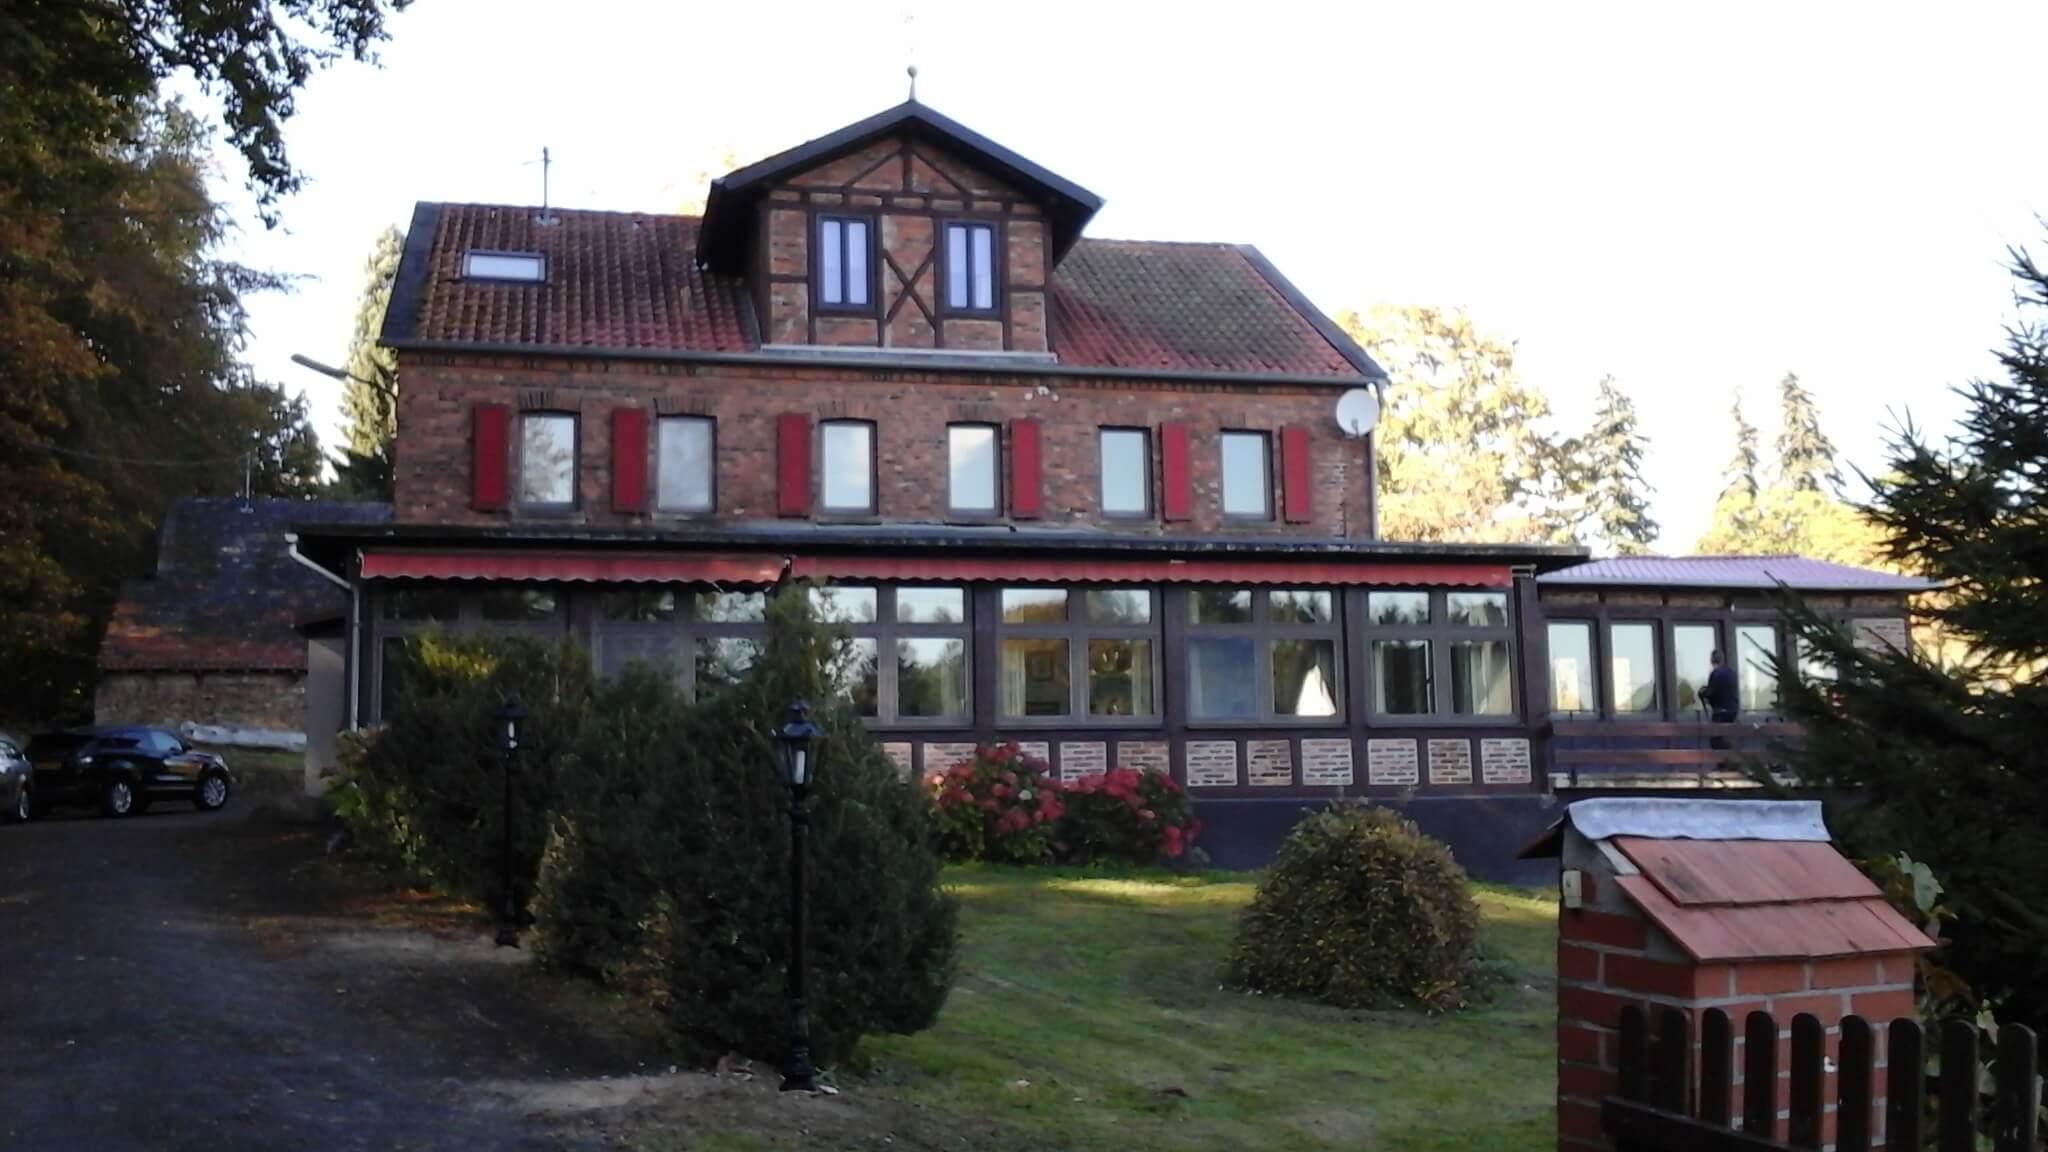 Waldfriede Seesbach|Steur Training & Begeleiding